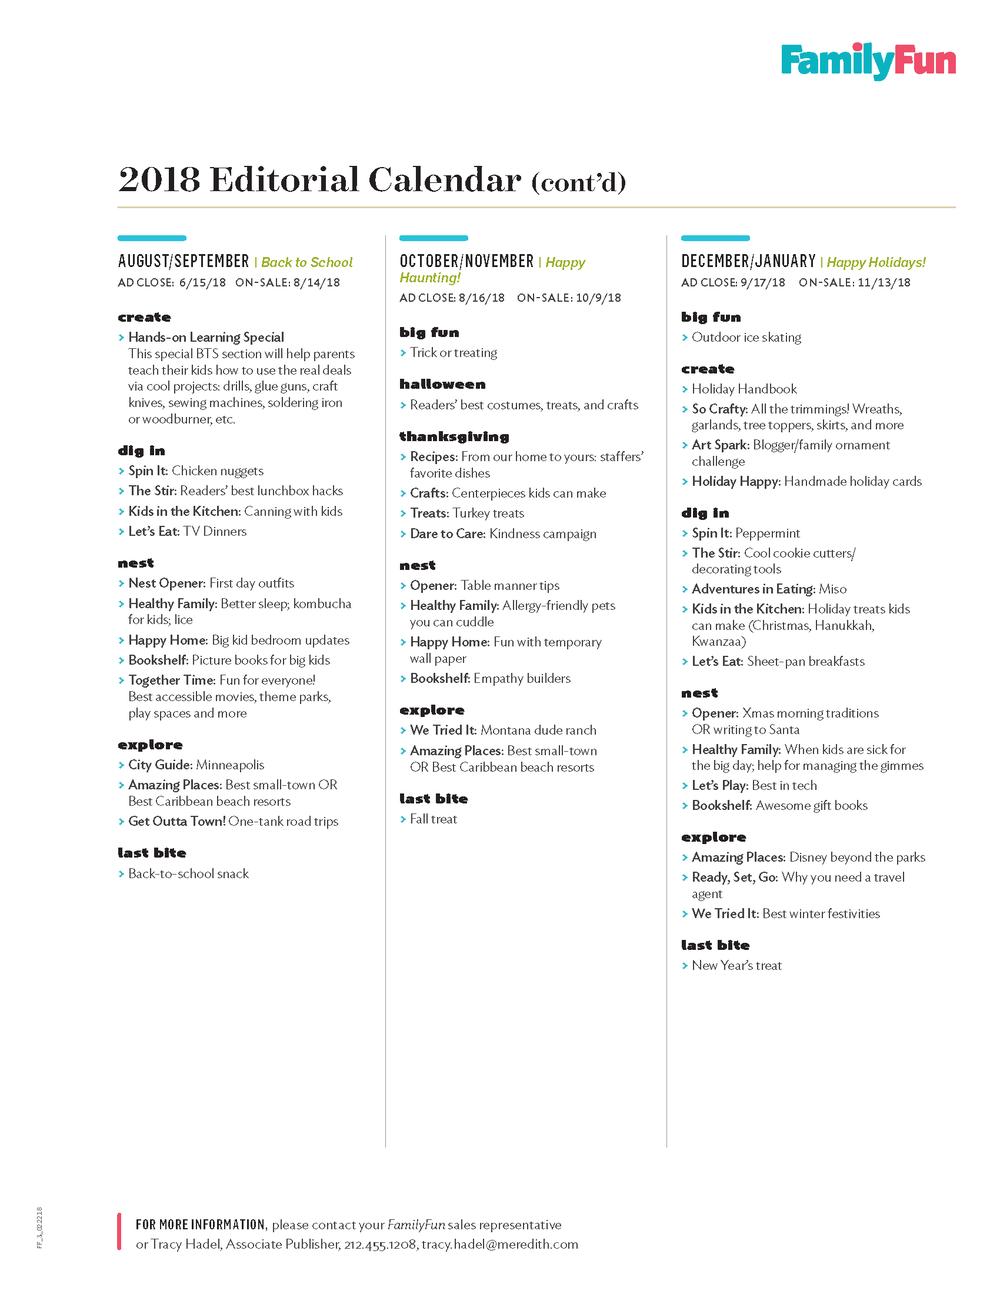 FF EditCalendar 2018 022318 Page 2